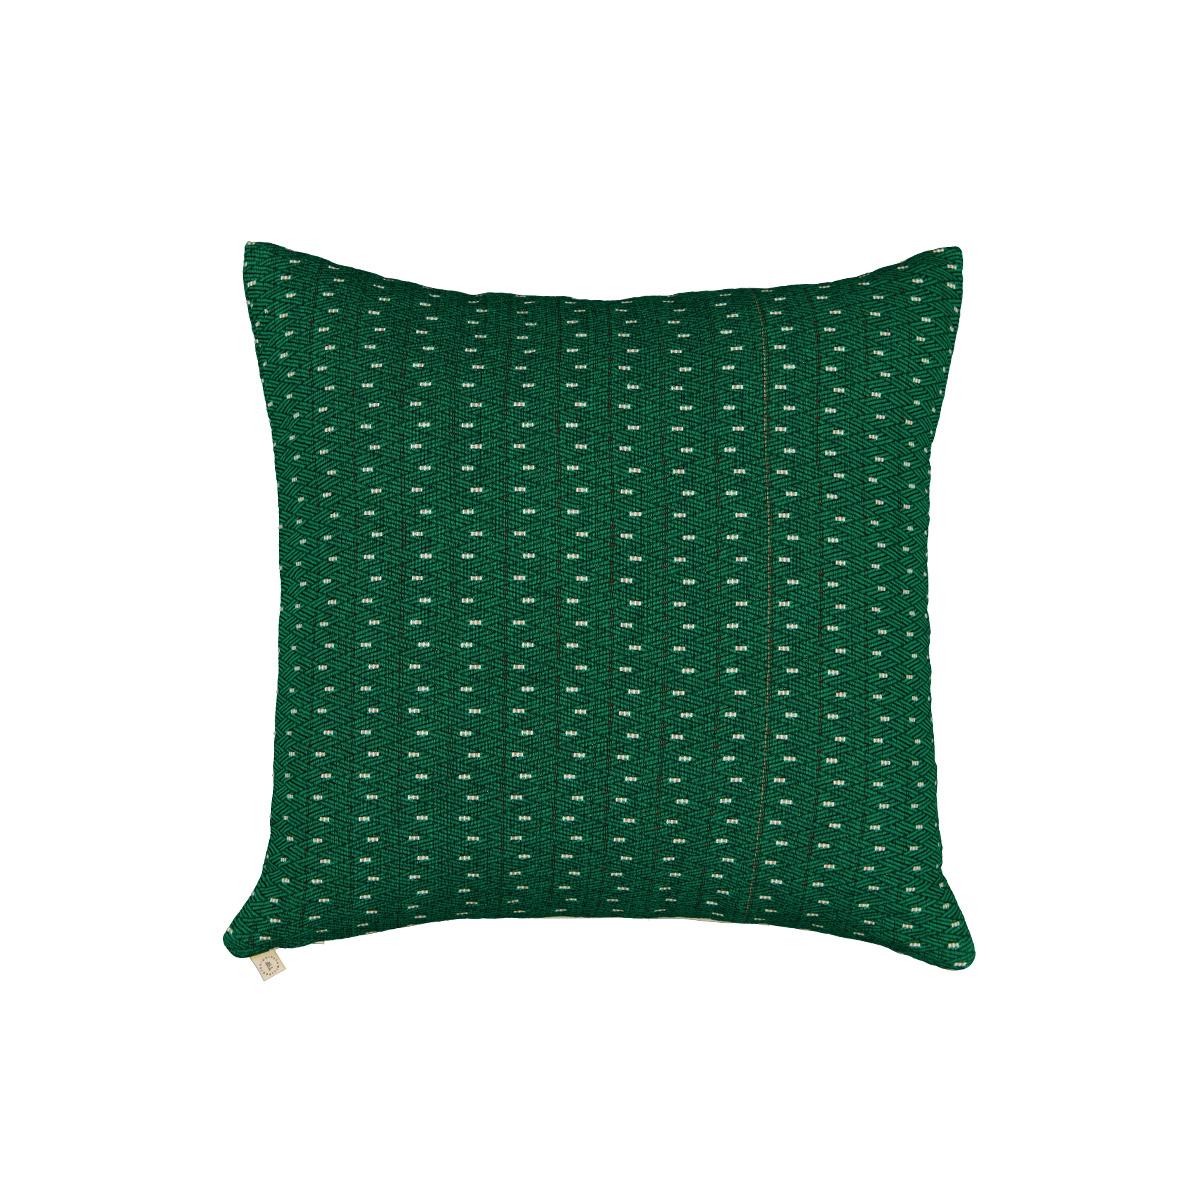 Coussin Viaggio motif vert